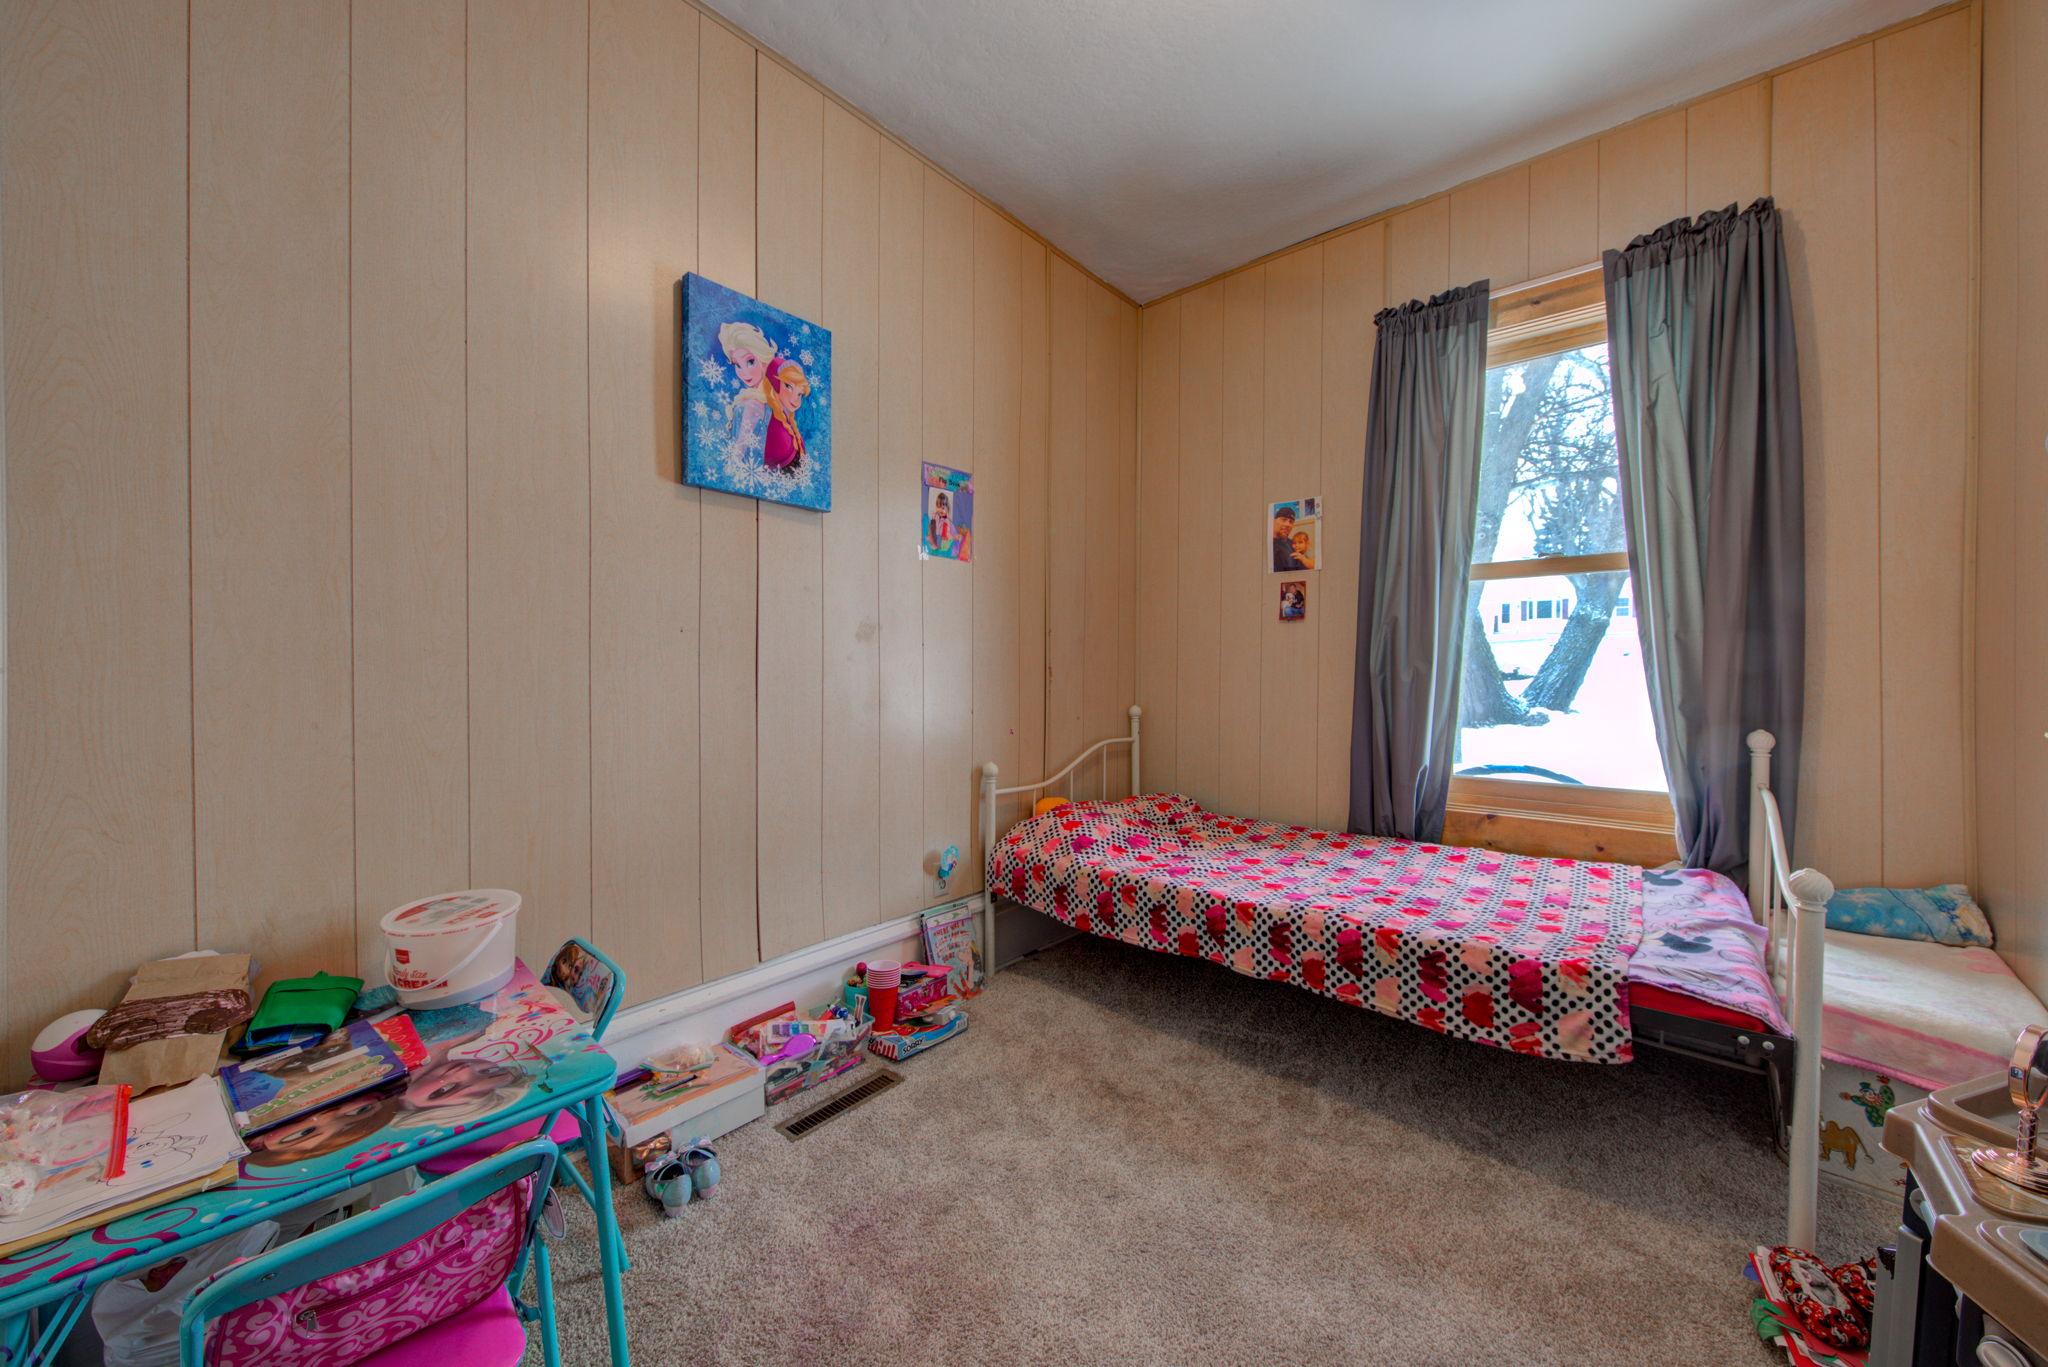 Unit 1 Bedroom 3